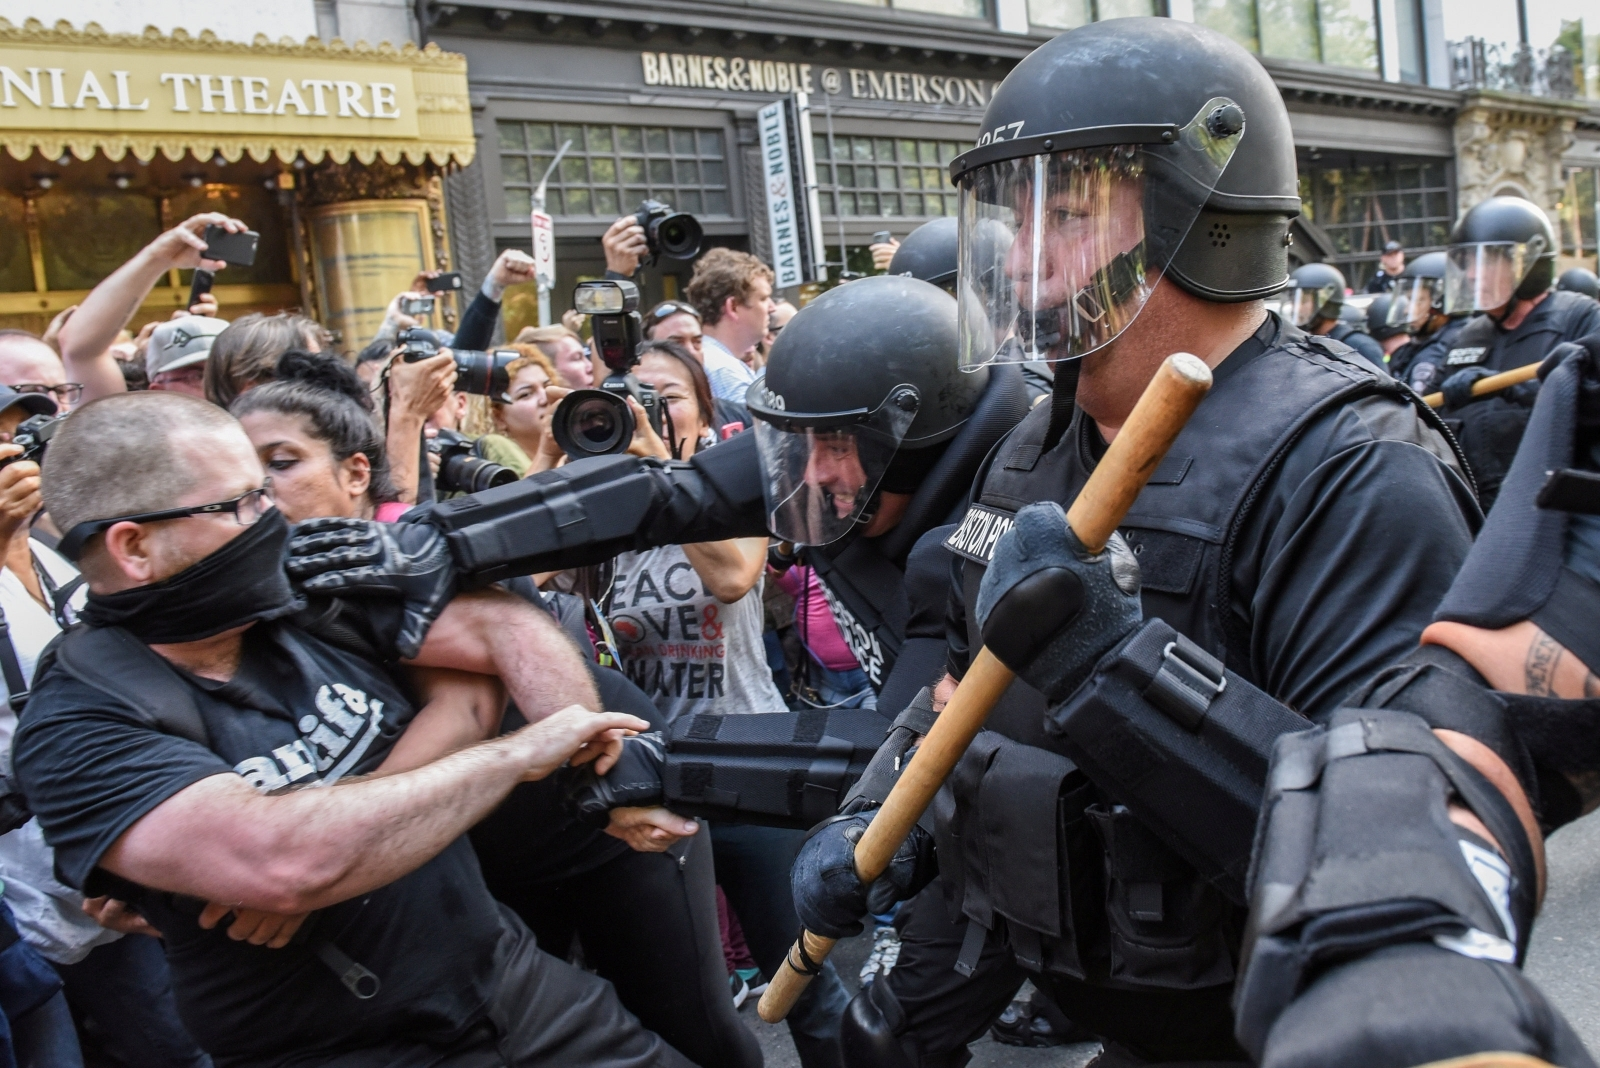 Boston Free Speech Rally Anti-Nazi Protesters